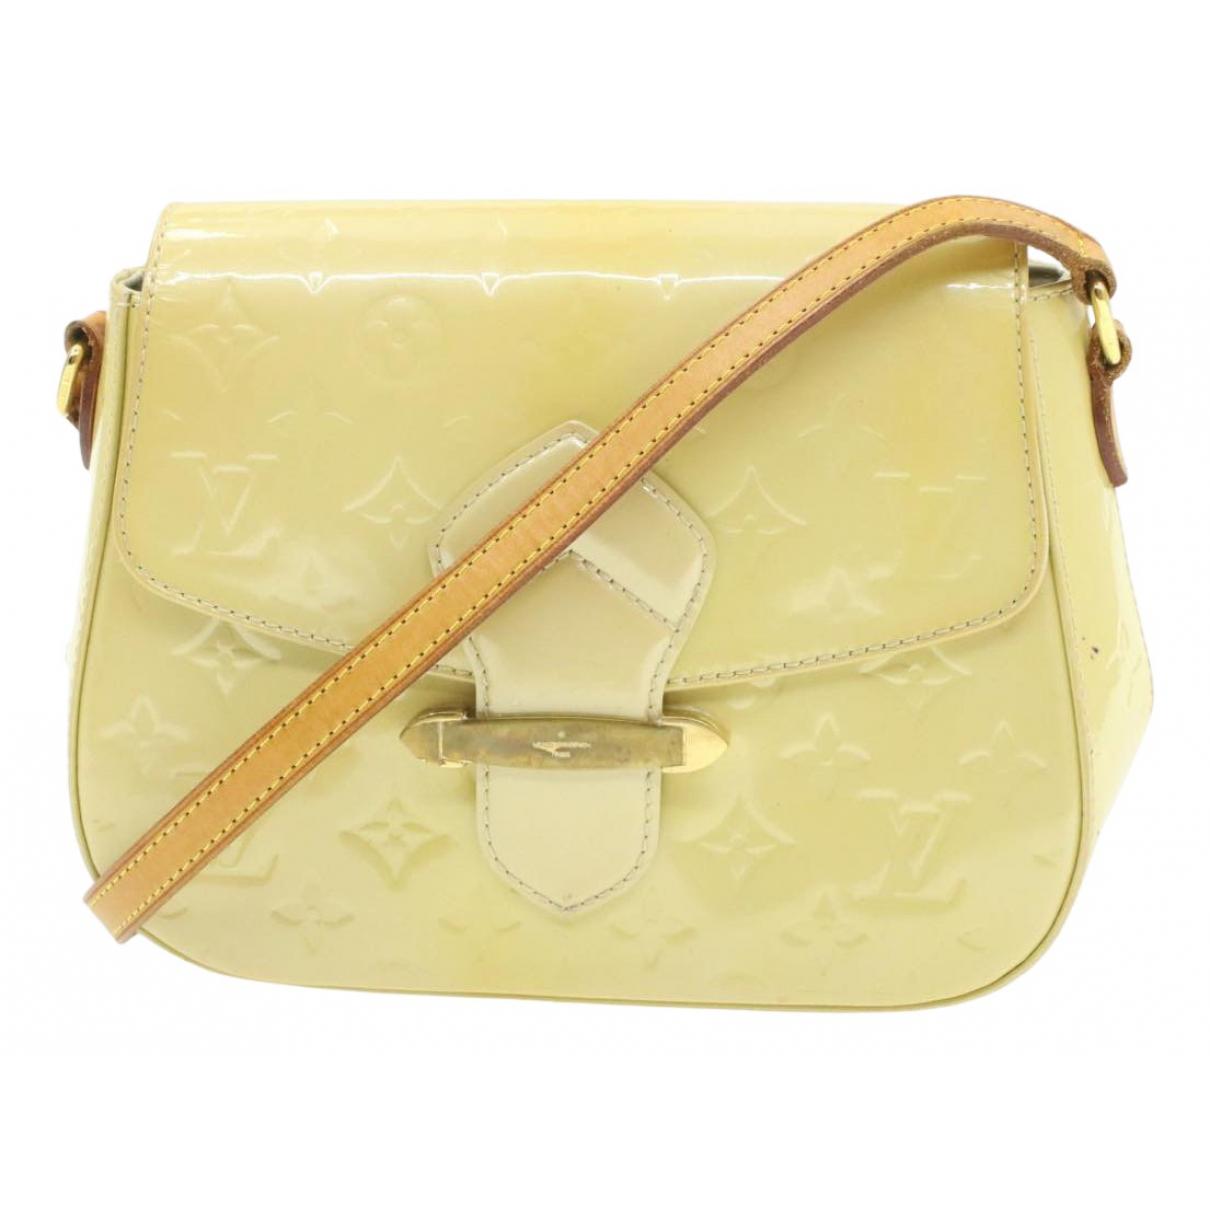 Louis Vuitton - Sac a main Bellflower pour femme en cuir verni - beige